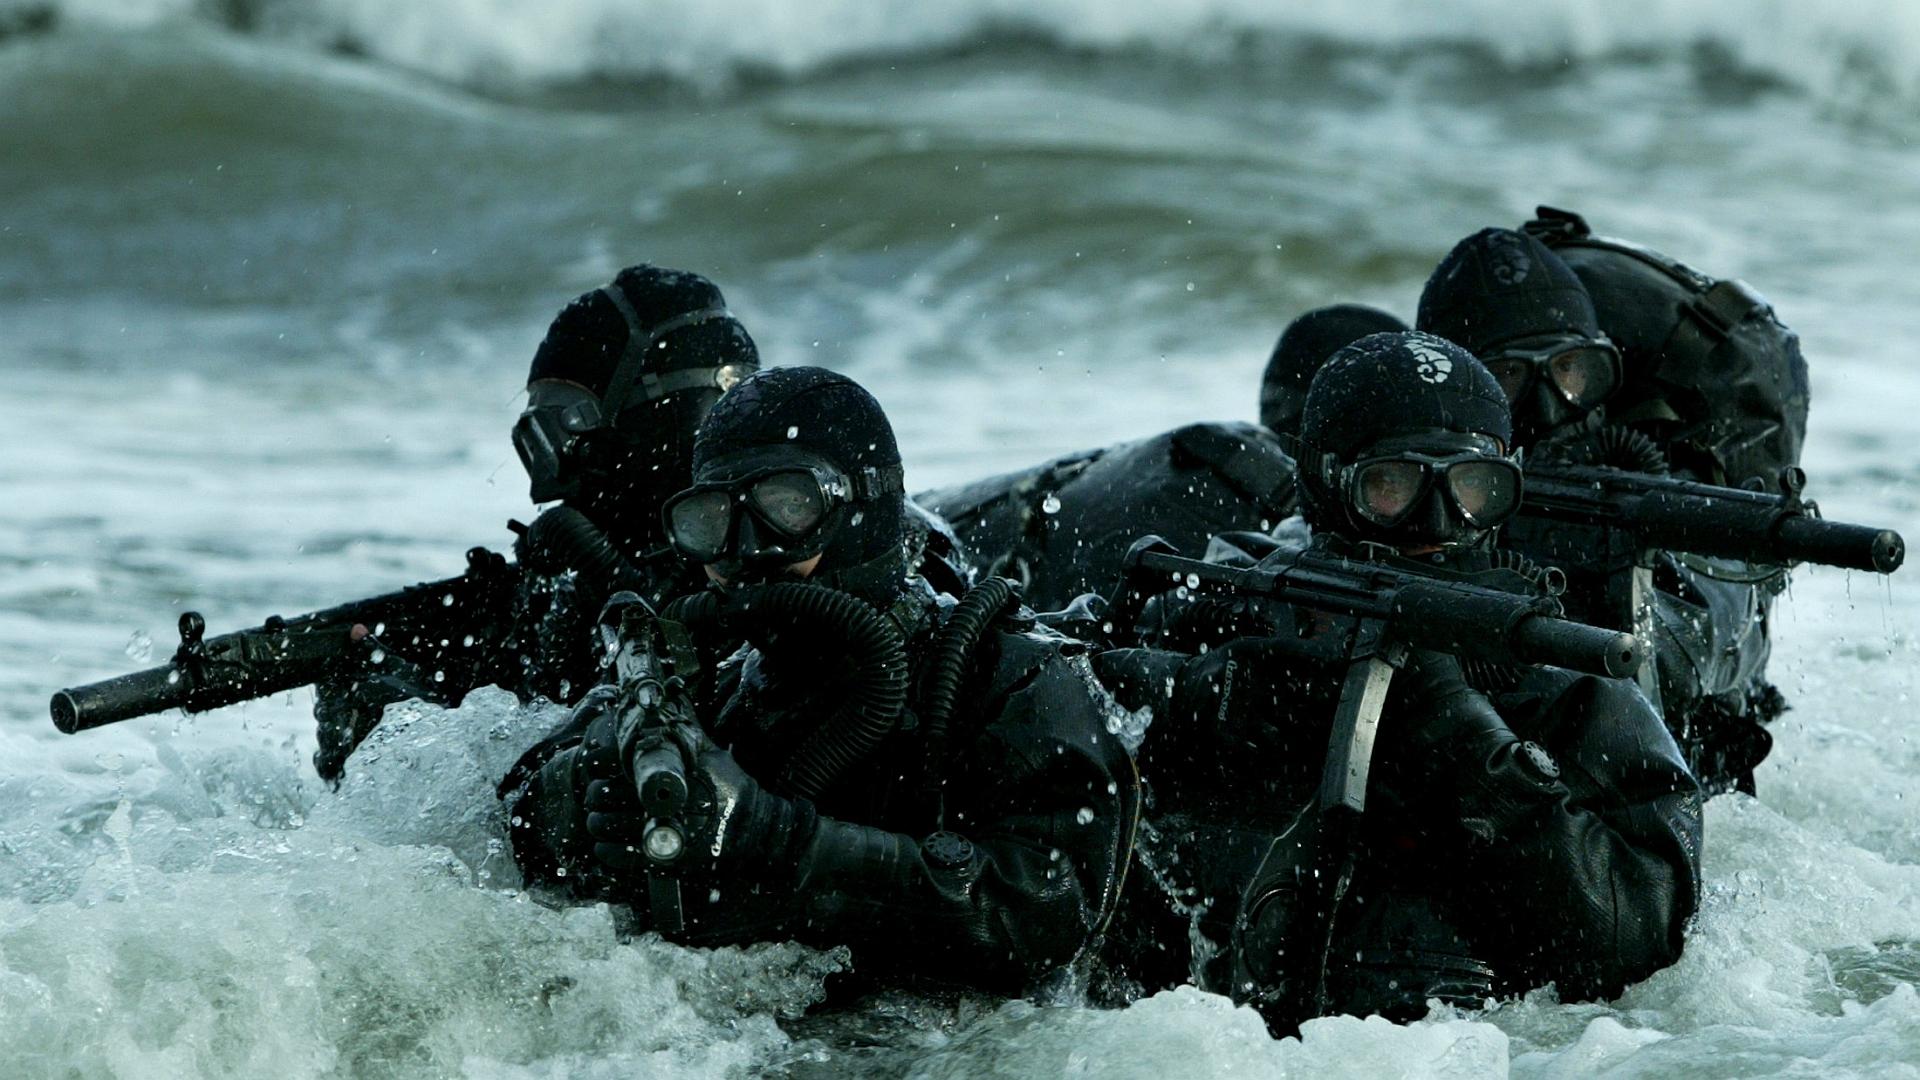 wallpopercomwallpapermilitary soldier 216276 1920x1080